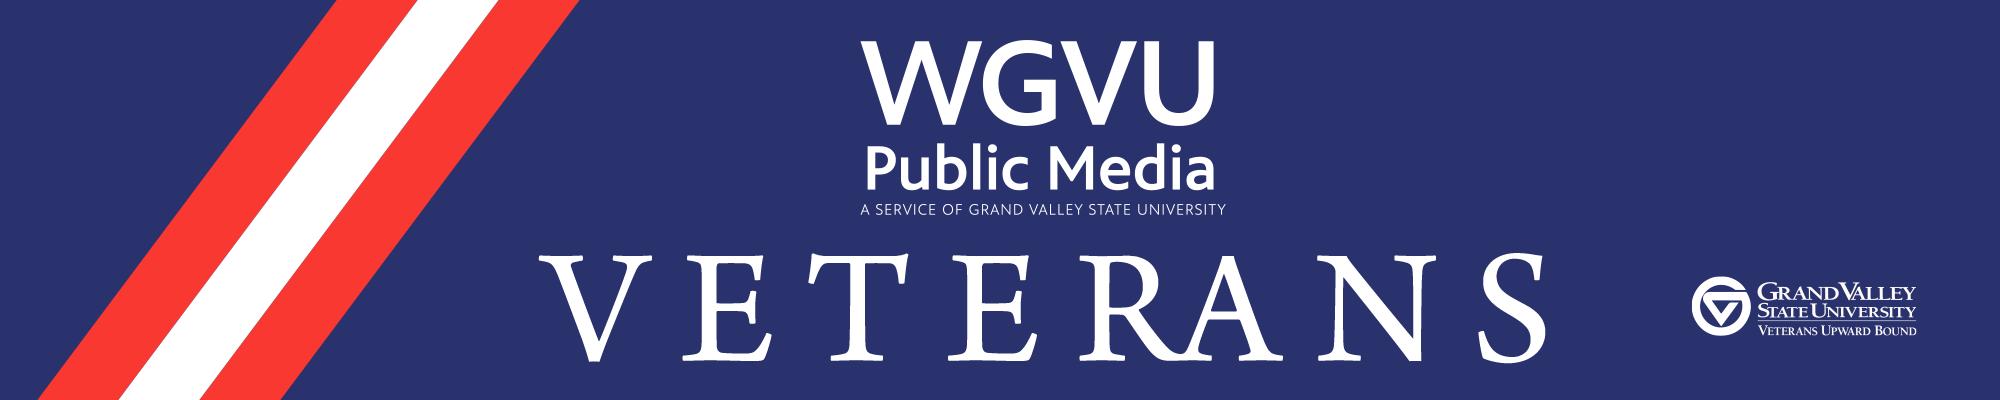 WGVU Public Media Veterans